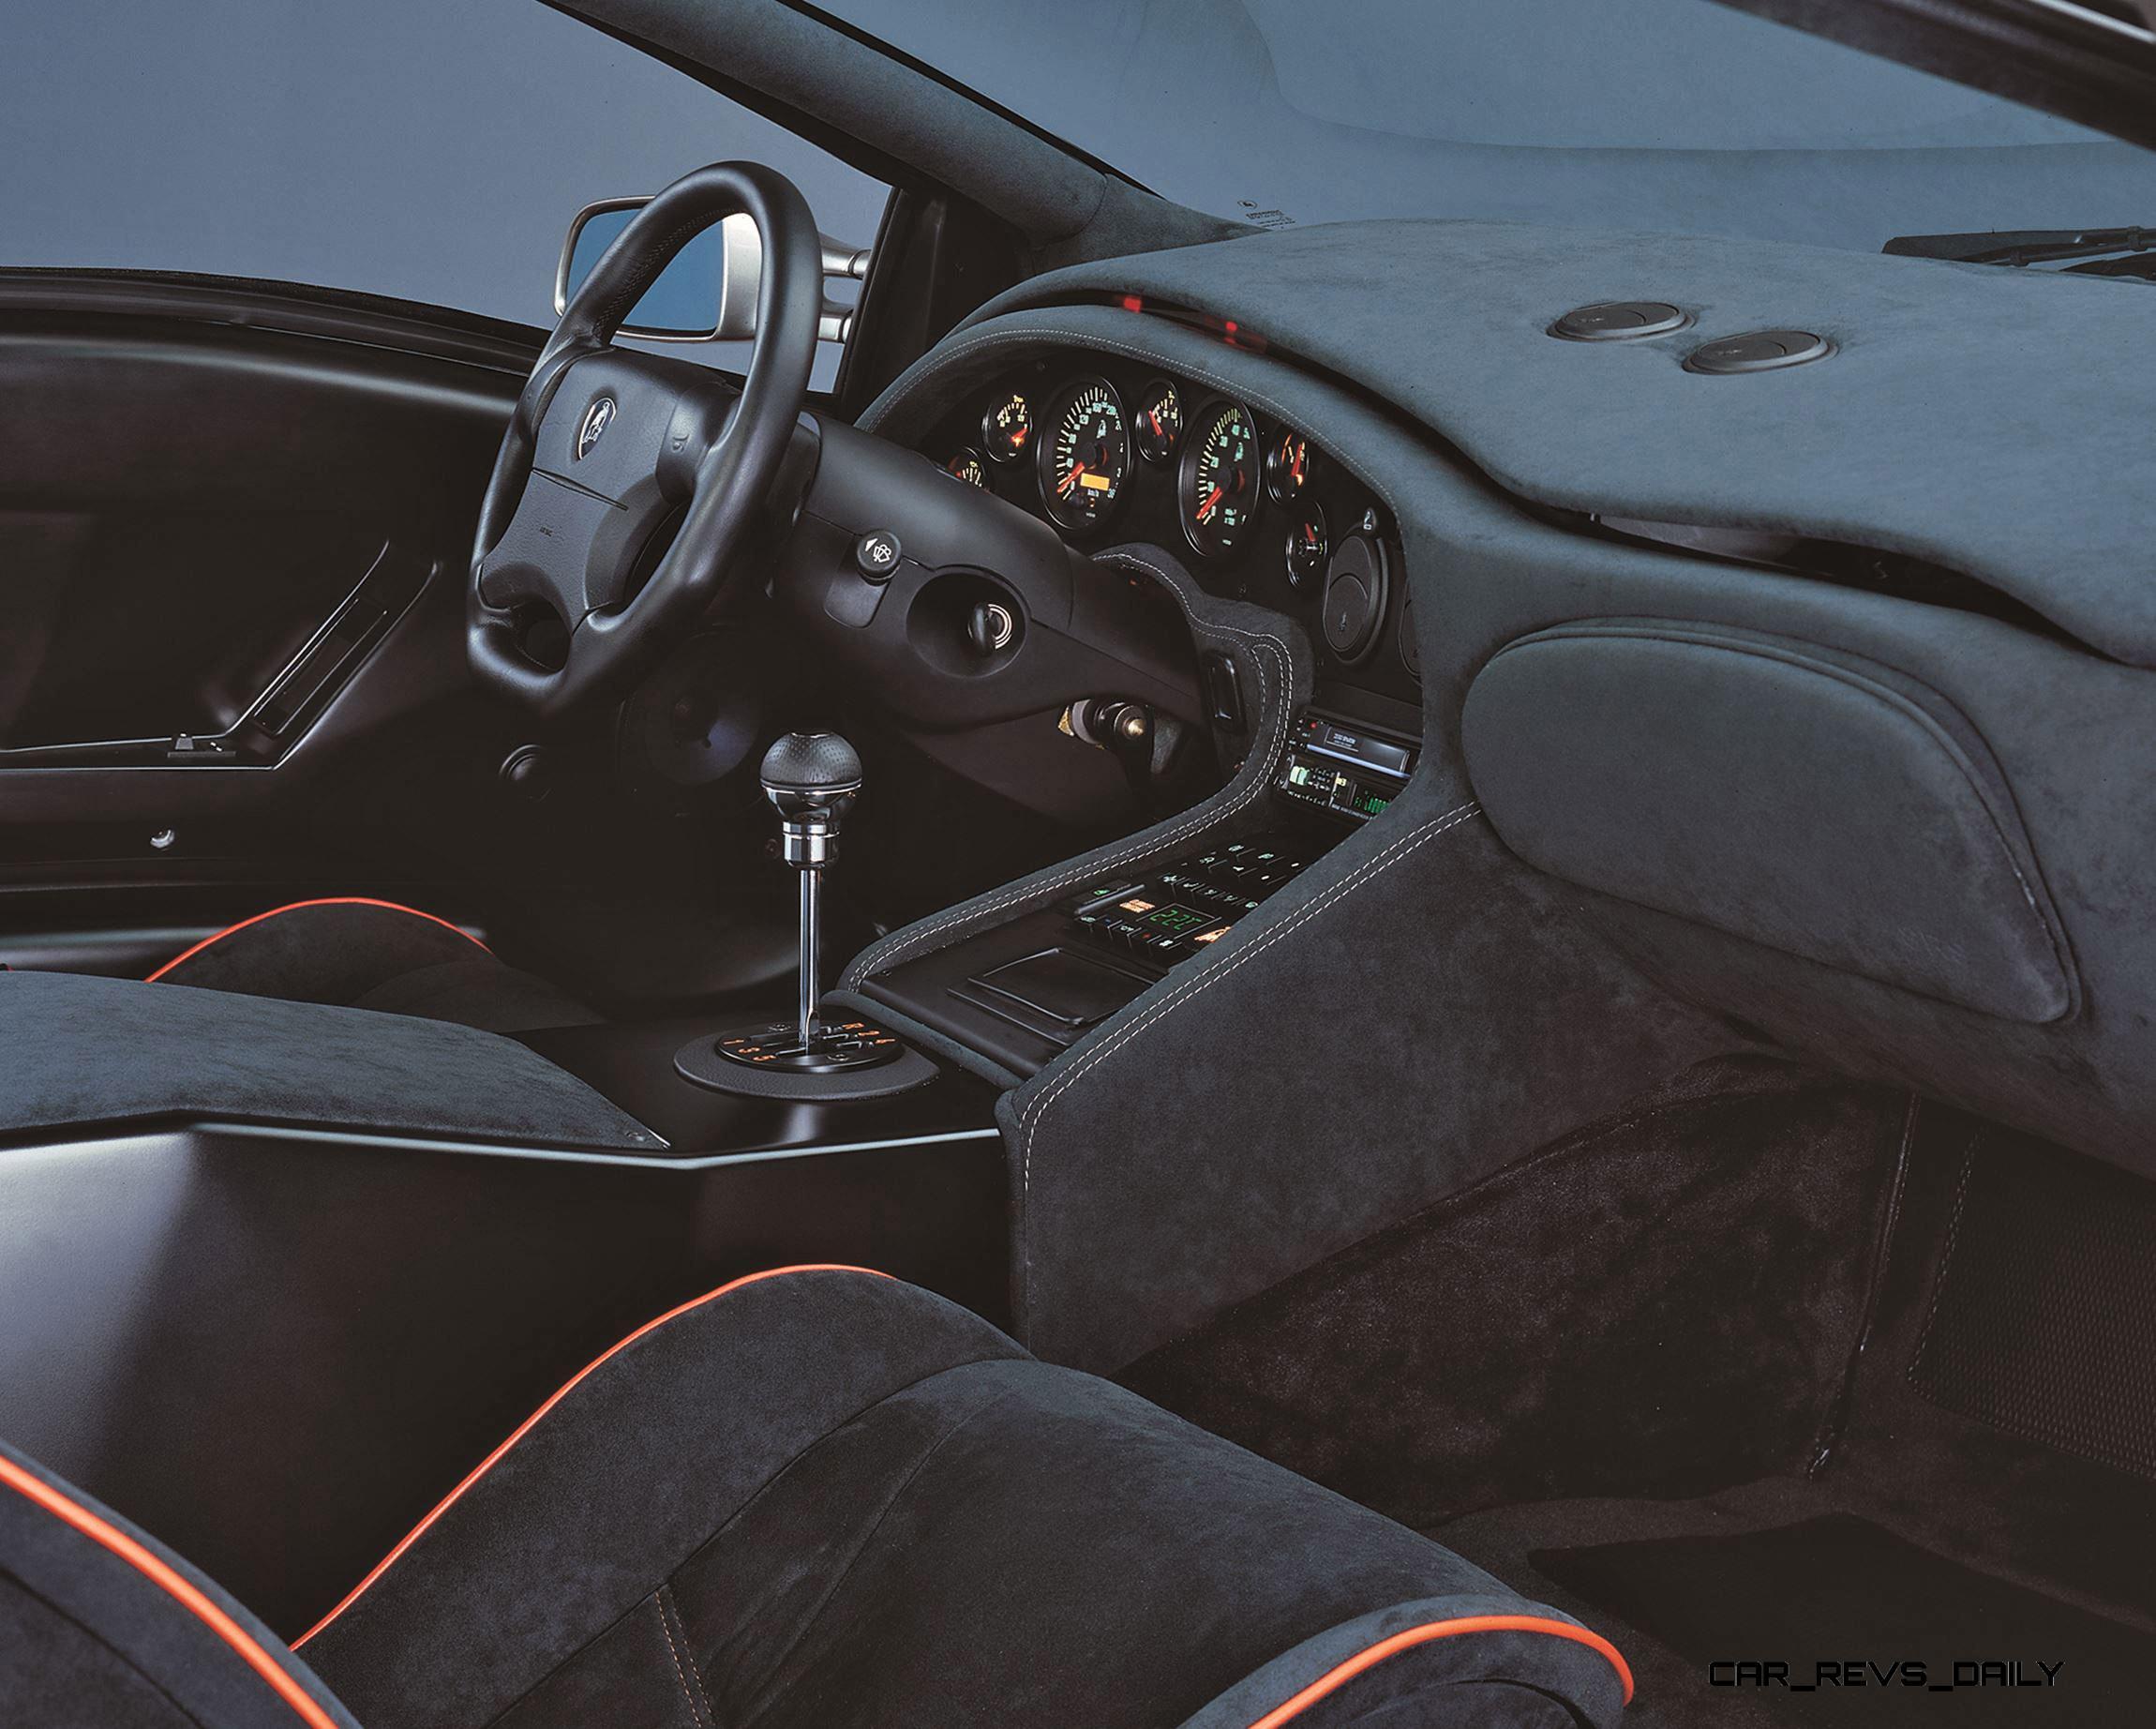 http://www.car-revs-daily.com/wp-content/uploads/1996-Lamborghini-Diablo-SV-4.jpg